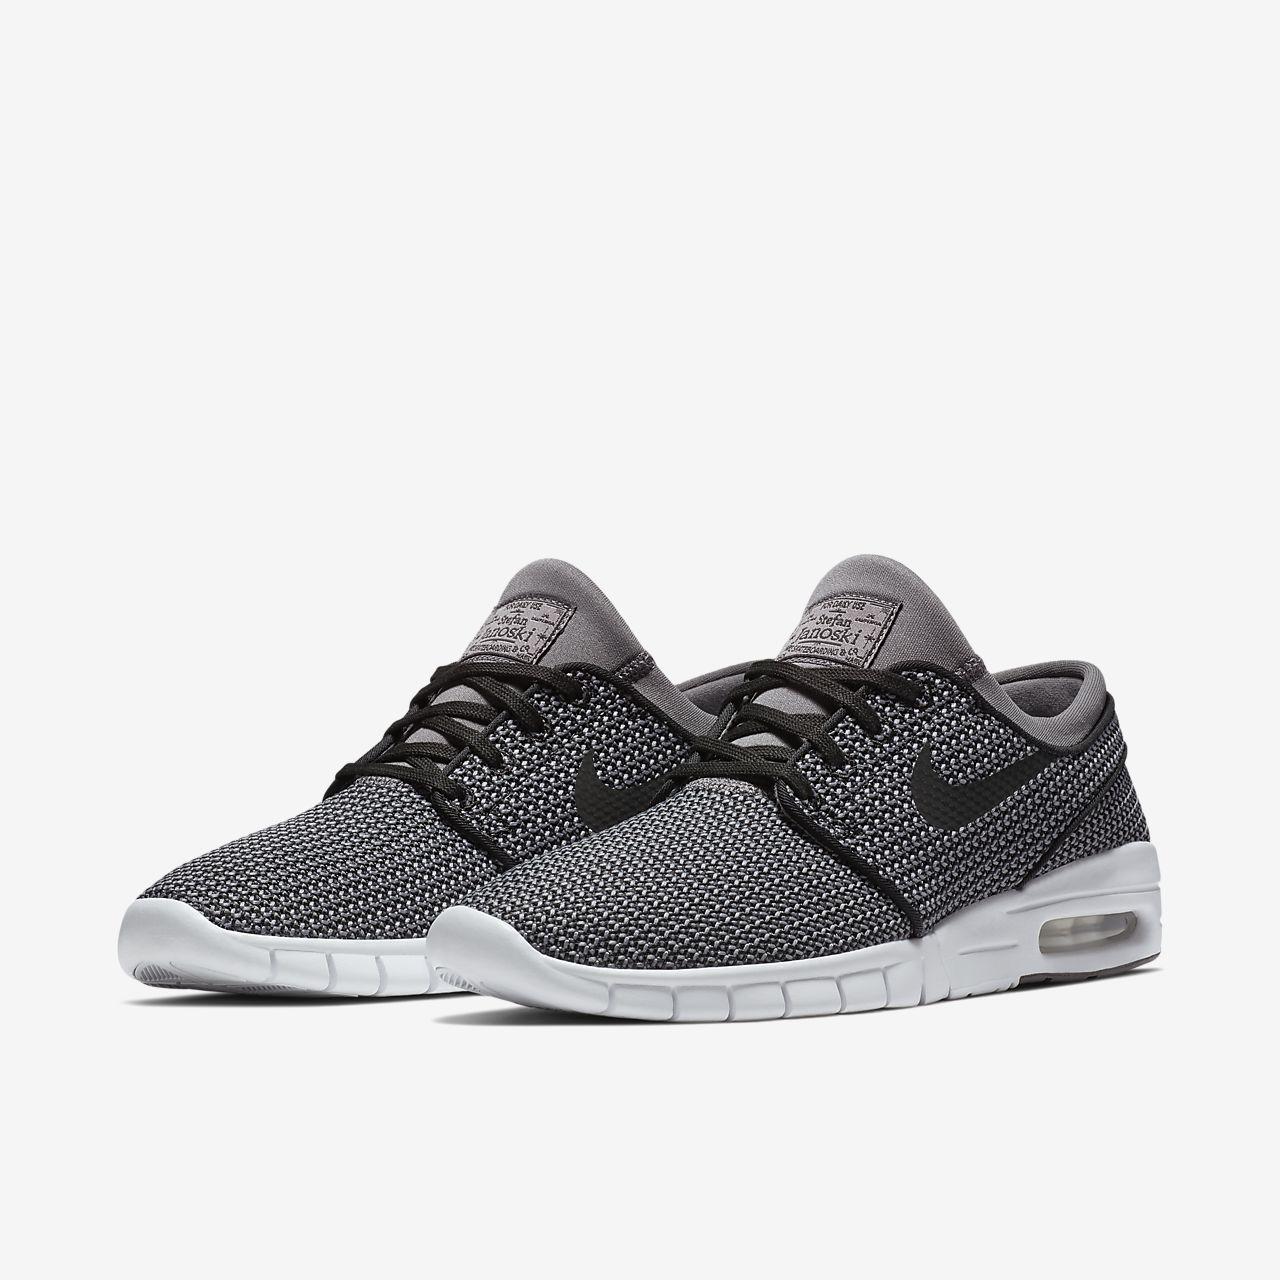 Nike Stefan Janoski Max / -Anthracite XbDCkvd